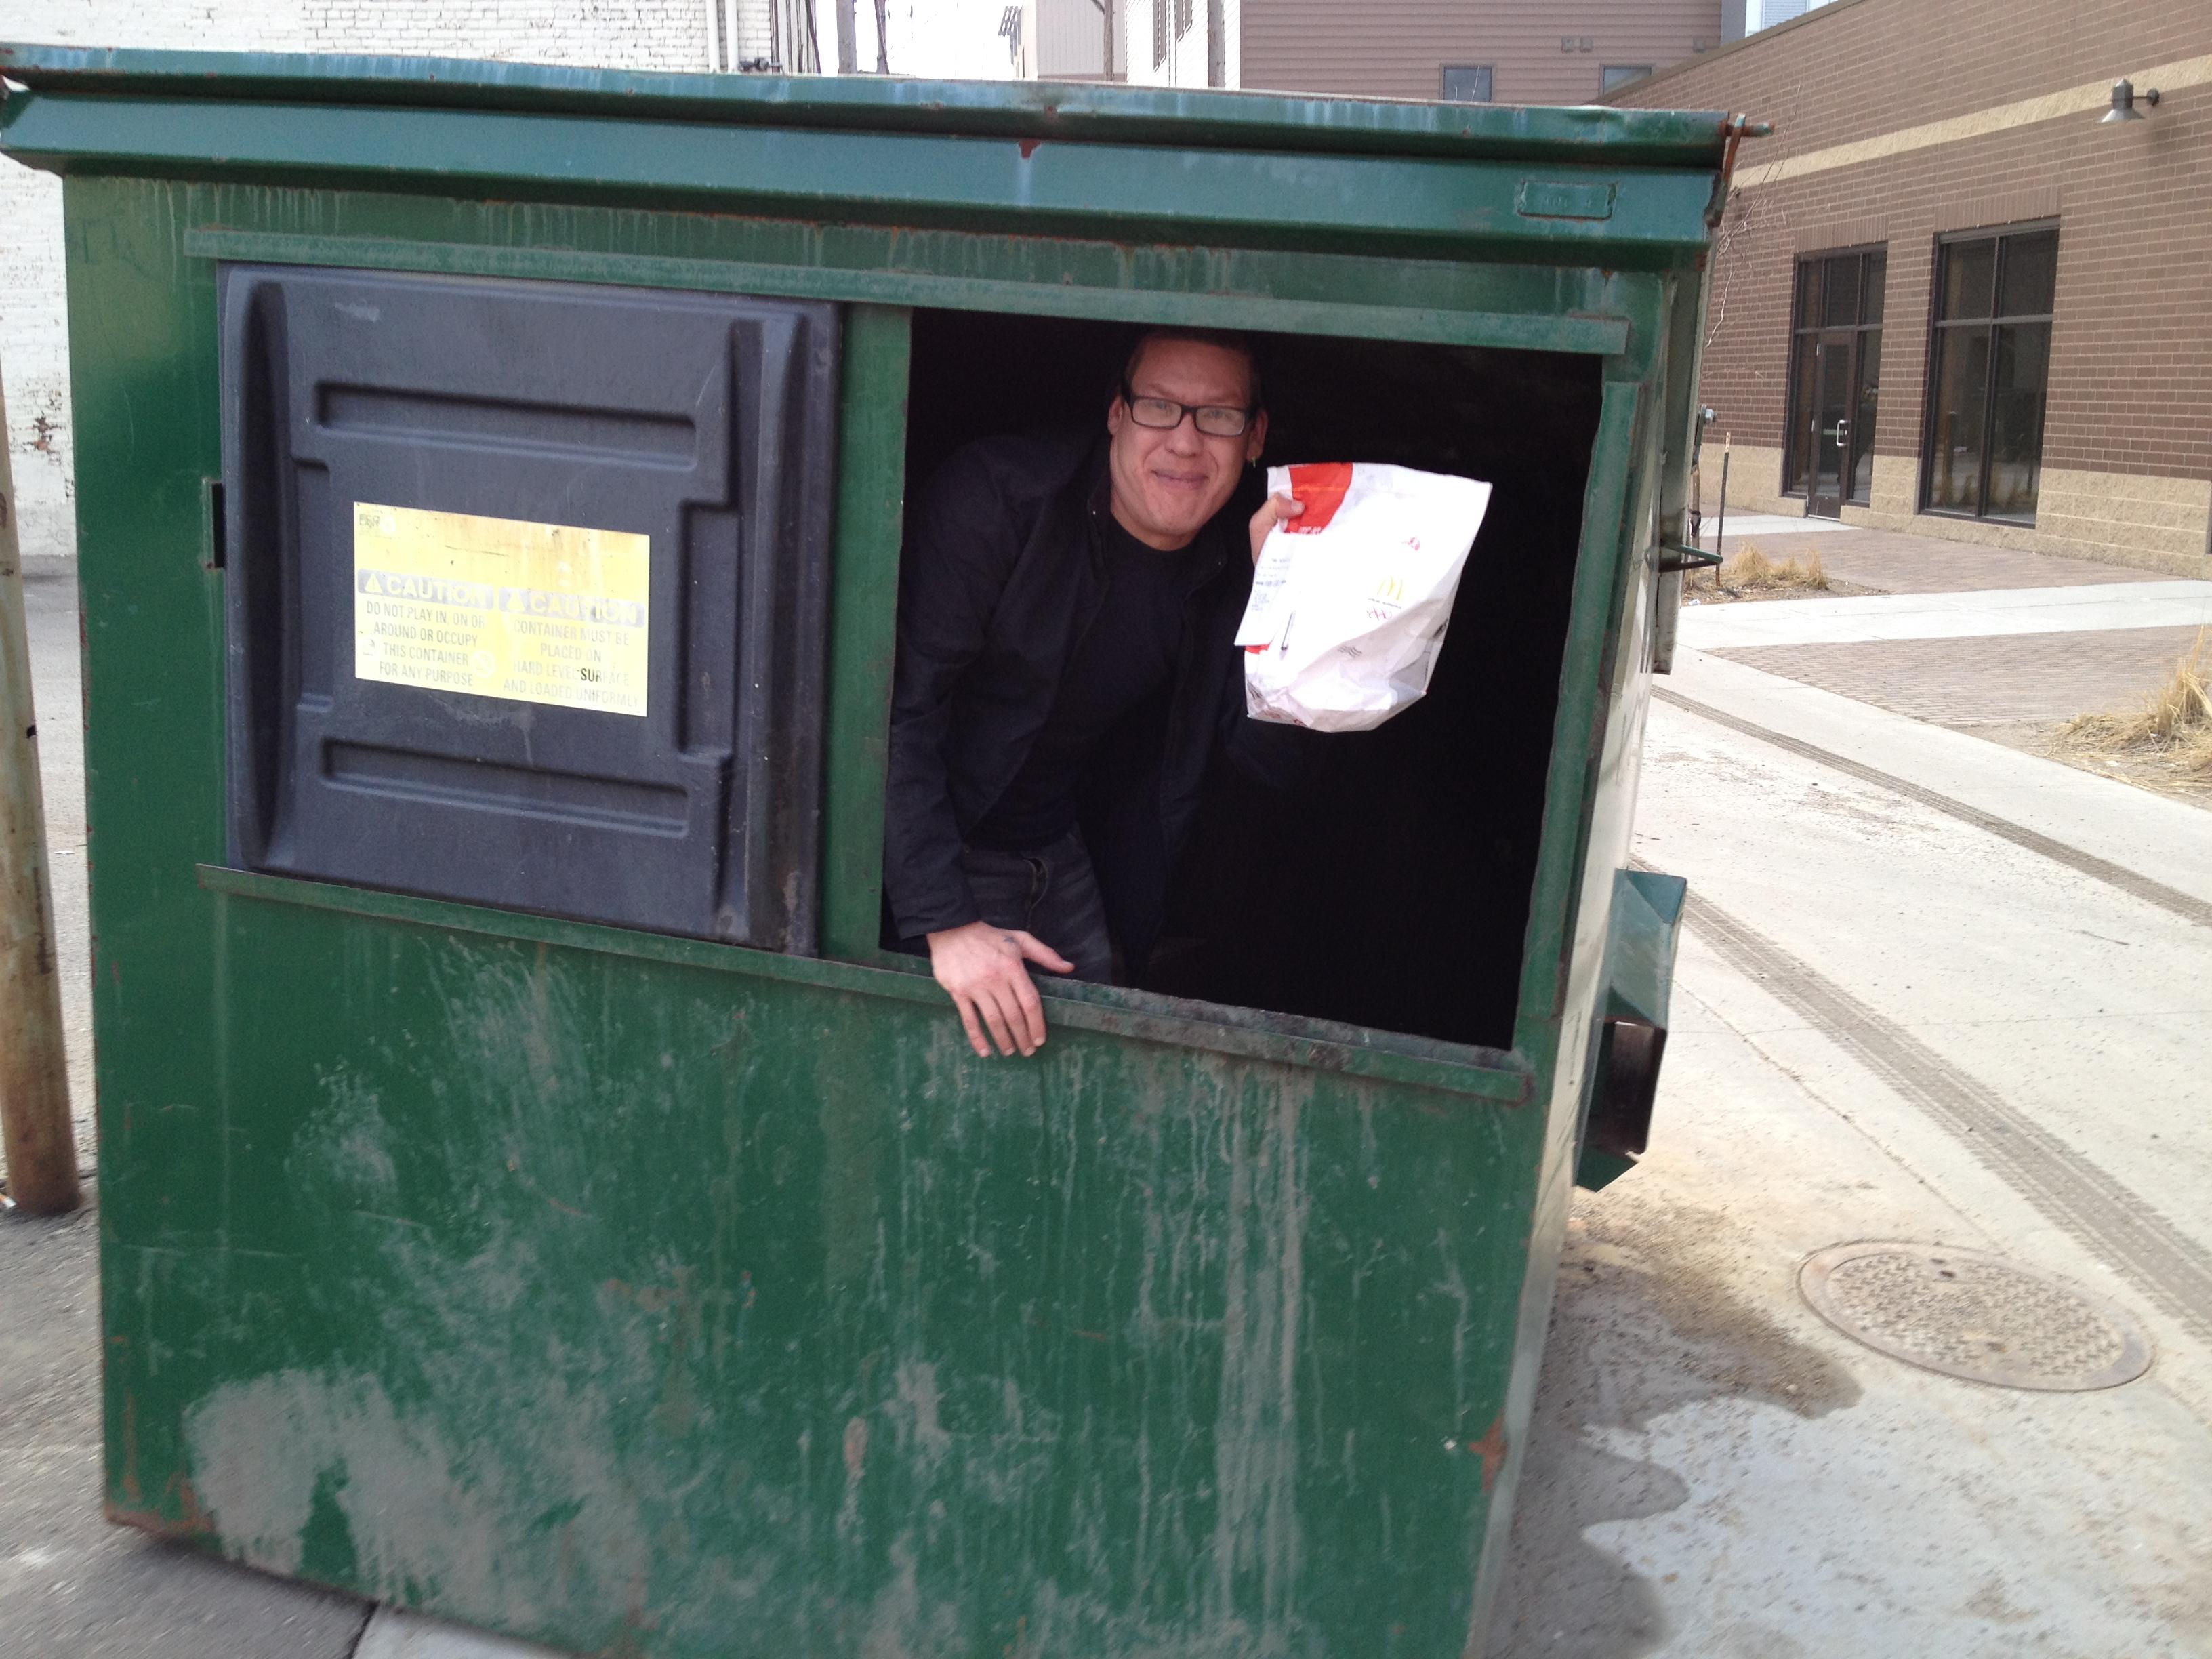 Tales of a Struggling Economy: Garbage Peddler Pete Wrigley, Jr.